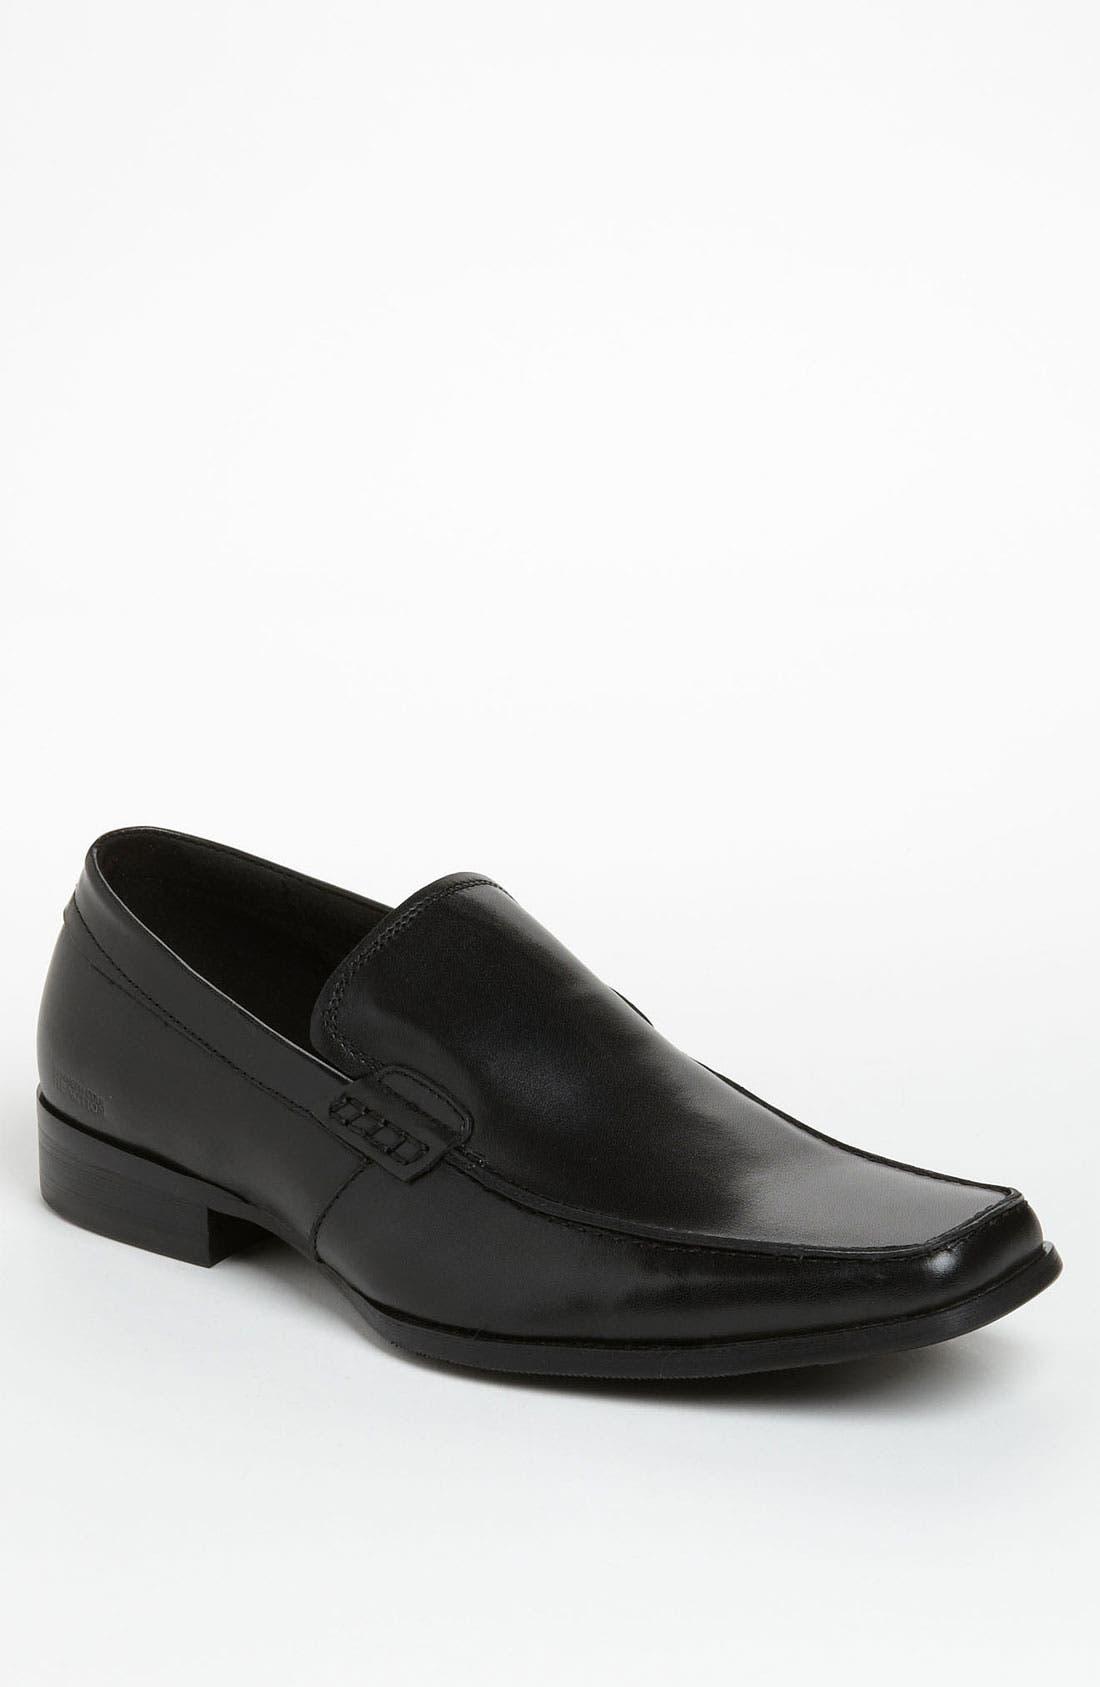 Alternate Image 1 Selected - Kenneth Cole Reaction 'Foot Model' Loafer (Online Only)